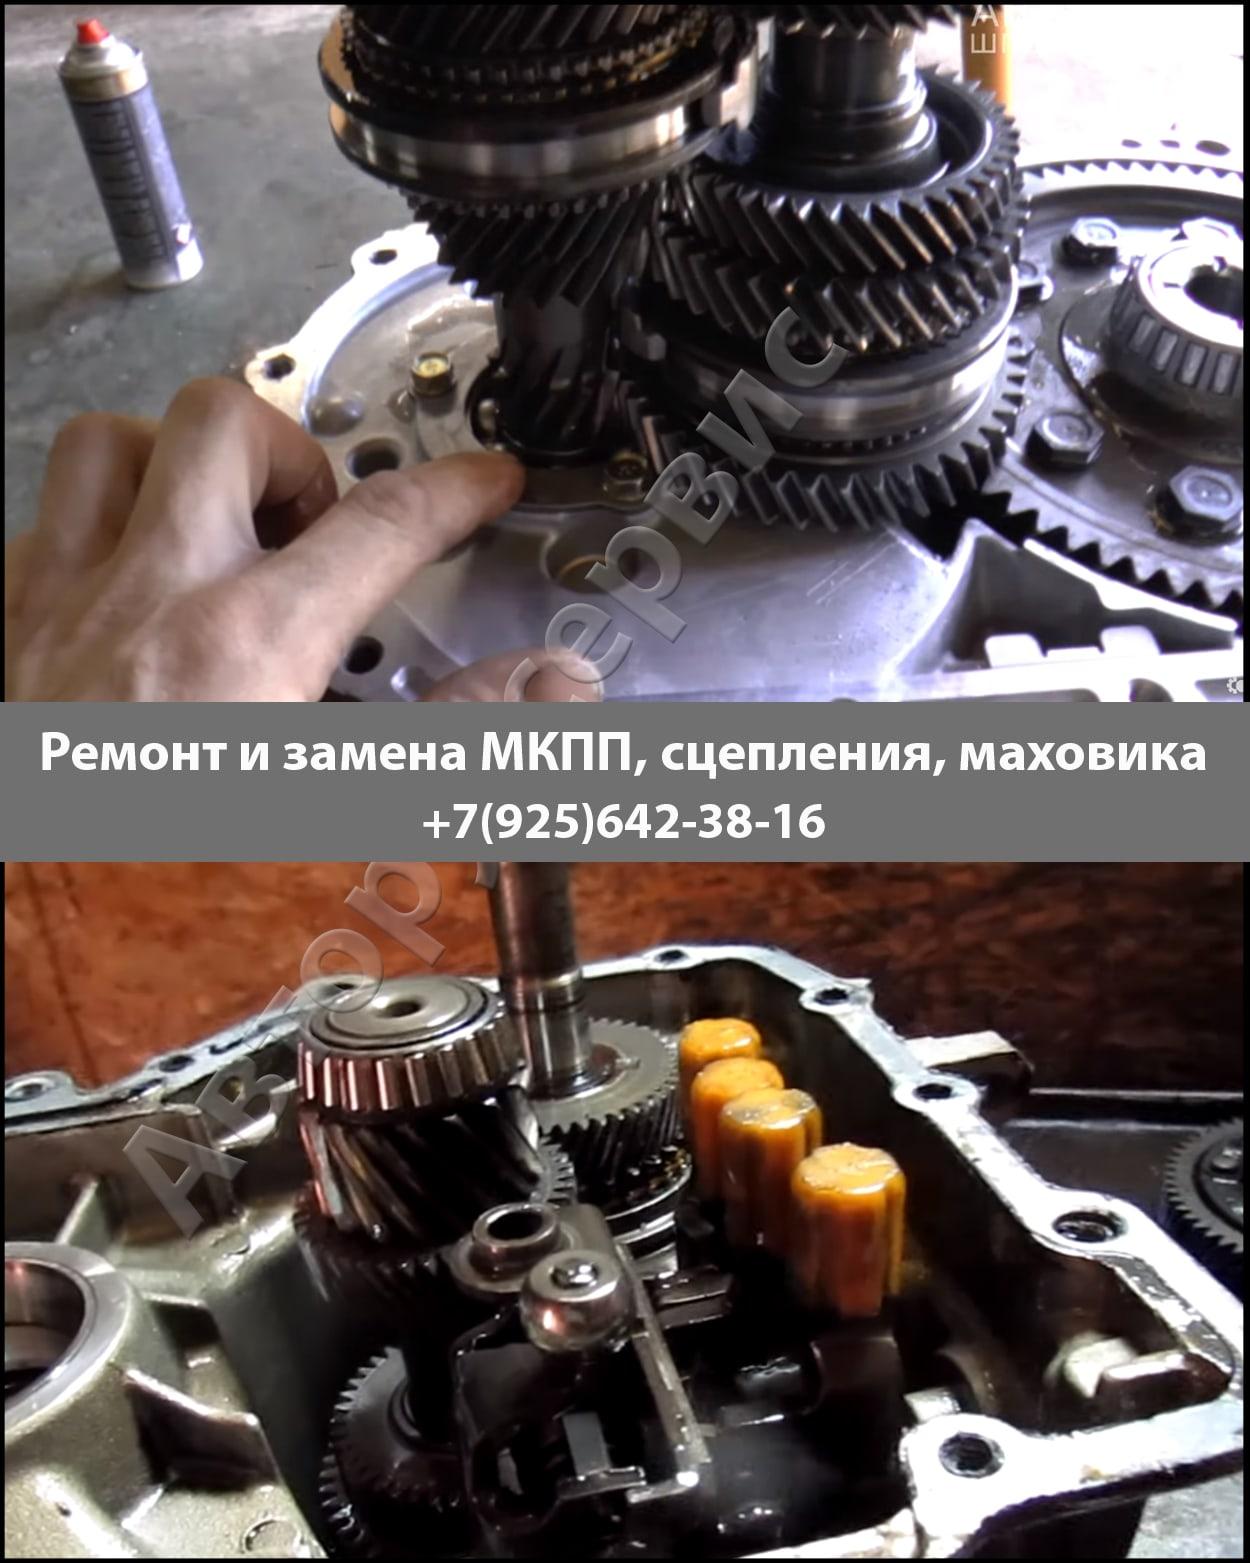 Ремонт МКПП Daewoo Magnus